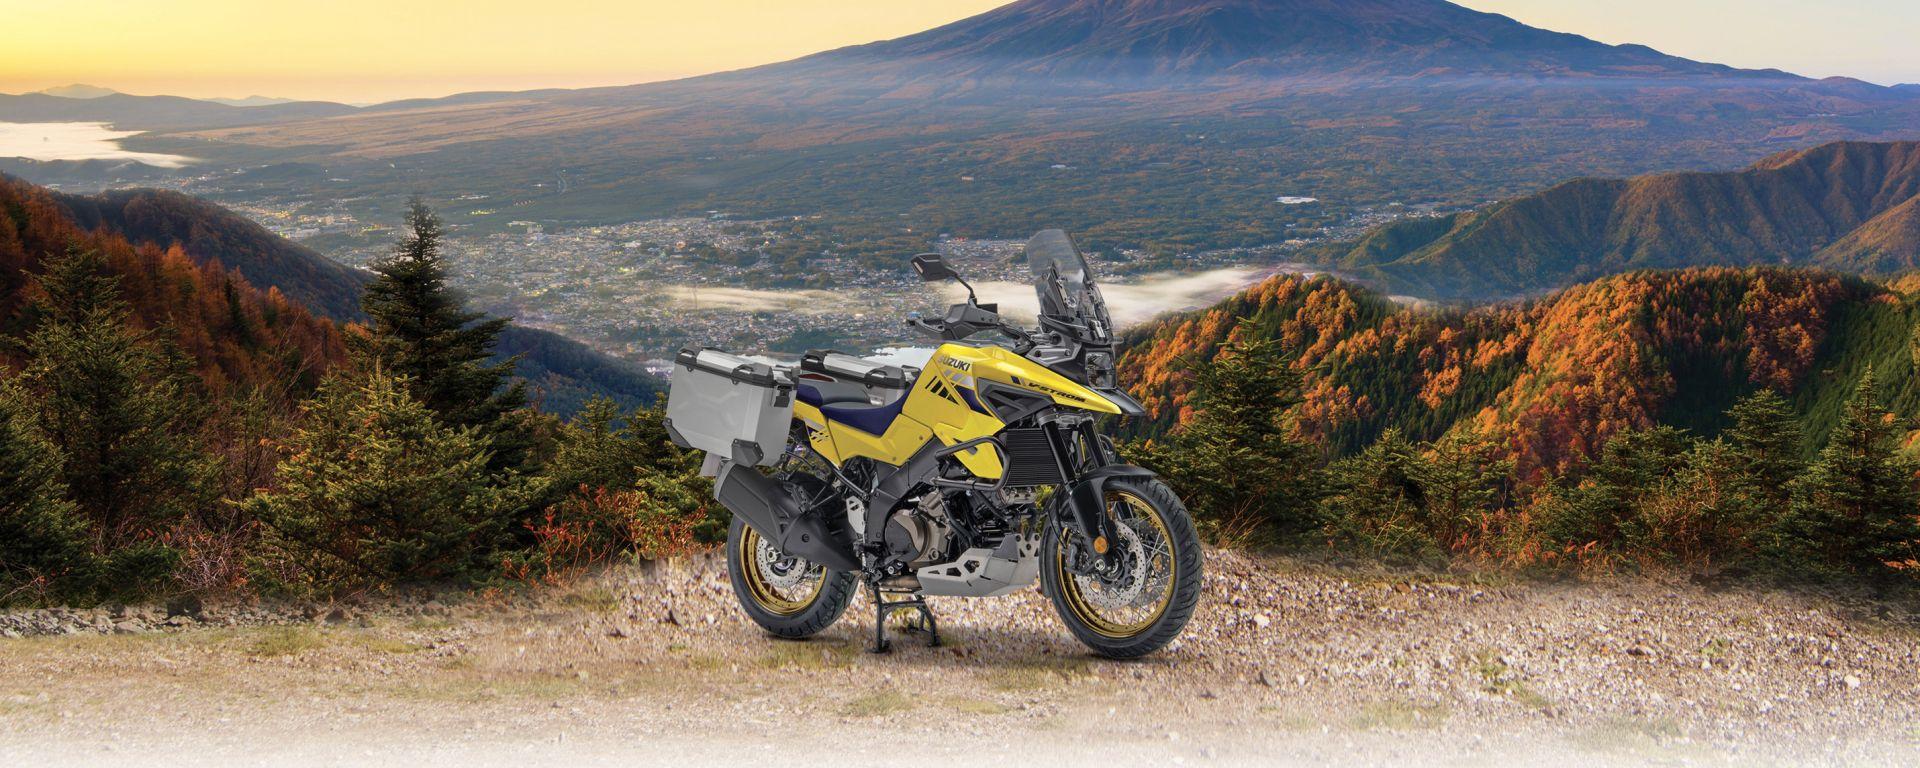 Suzuki V-Strom 1050 XT Pro, l'allestimento dedicato all'avventura